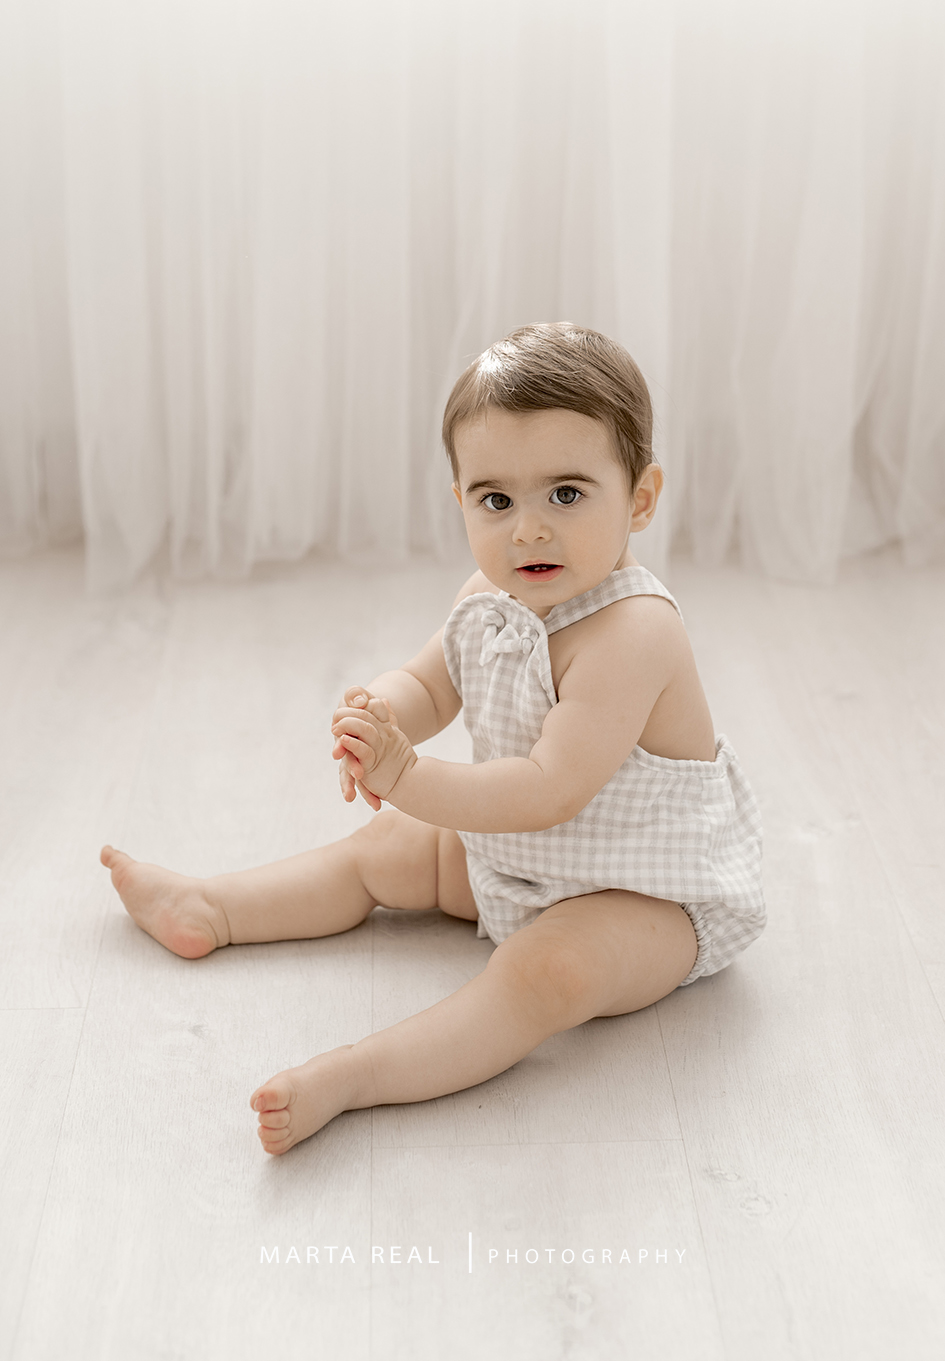 Mini Baby 7-10 months - Marta R Real, Fotografia